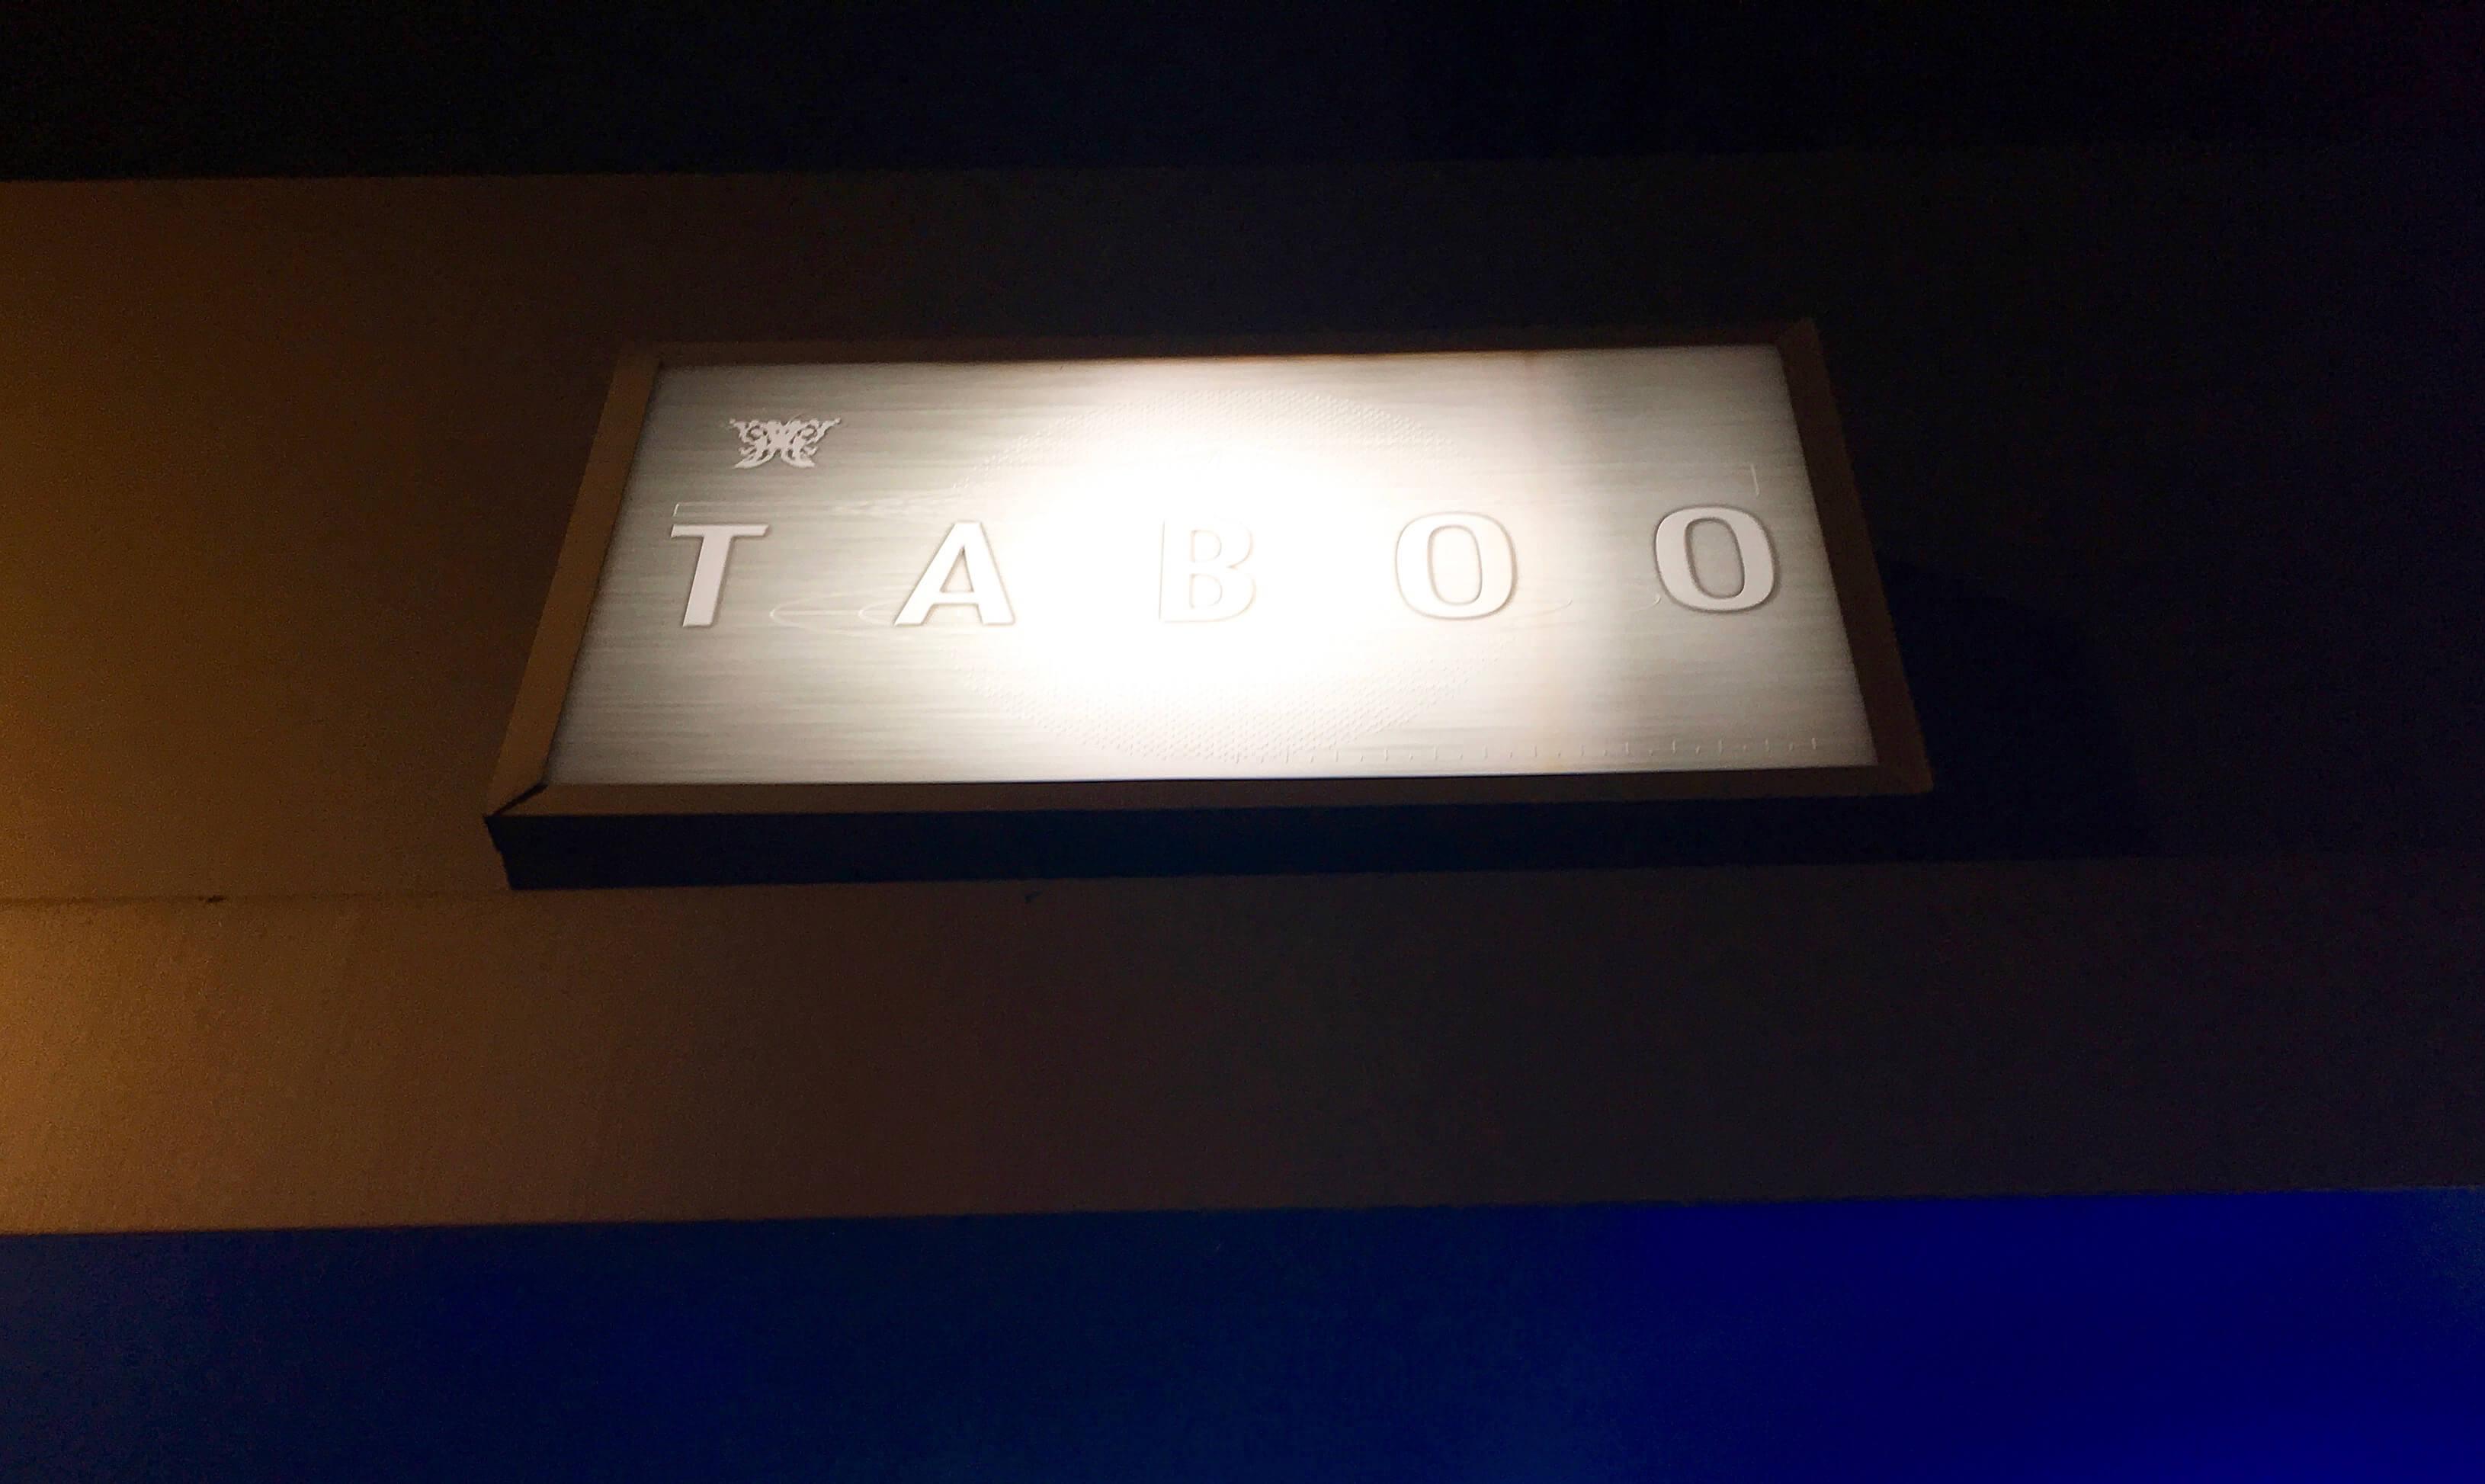 taboo 看板